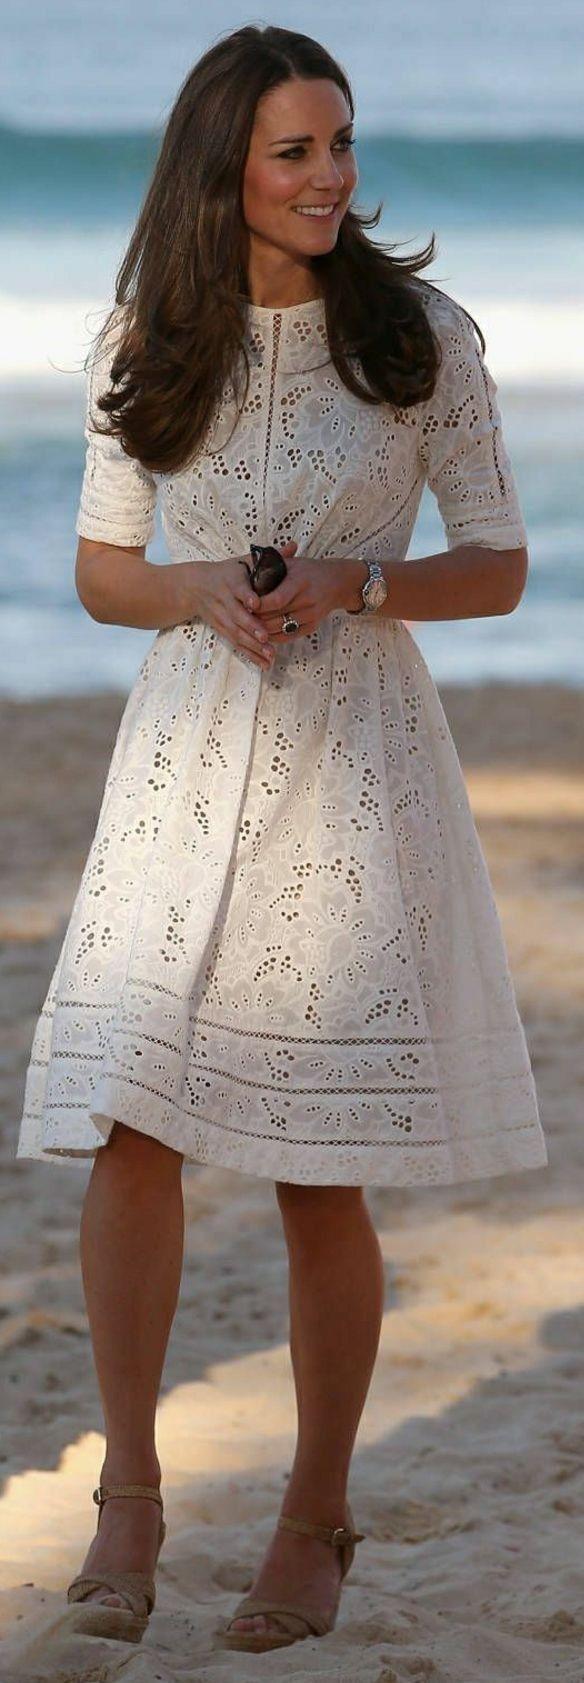 #boho #fashion #spring #outfitideas |Kate Middleton White Chic Boho Dress                                                                             Source